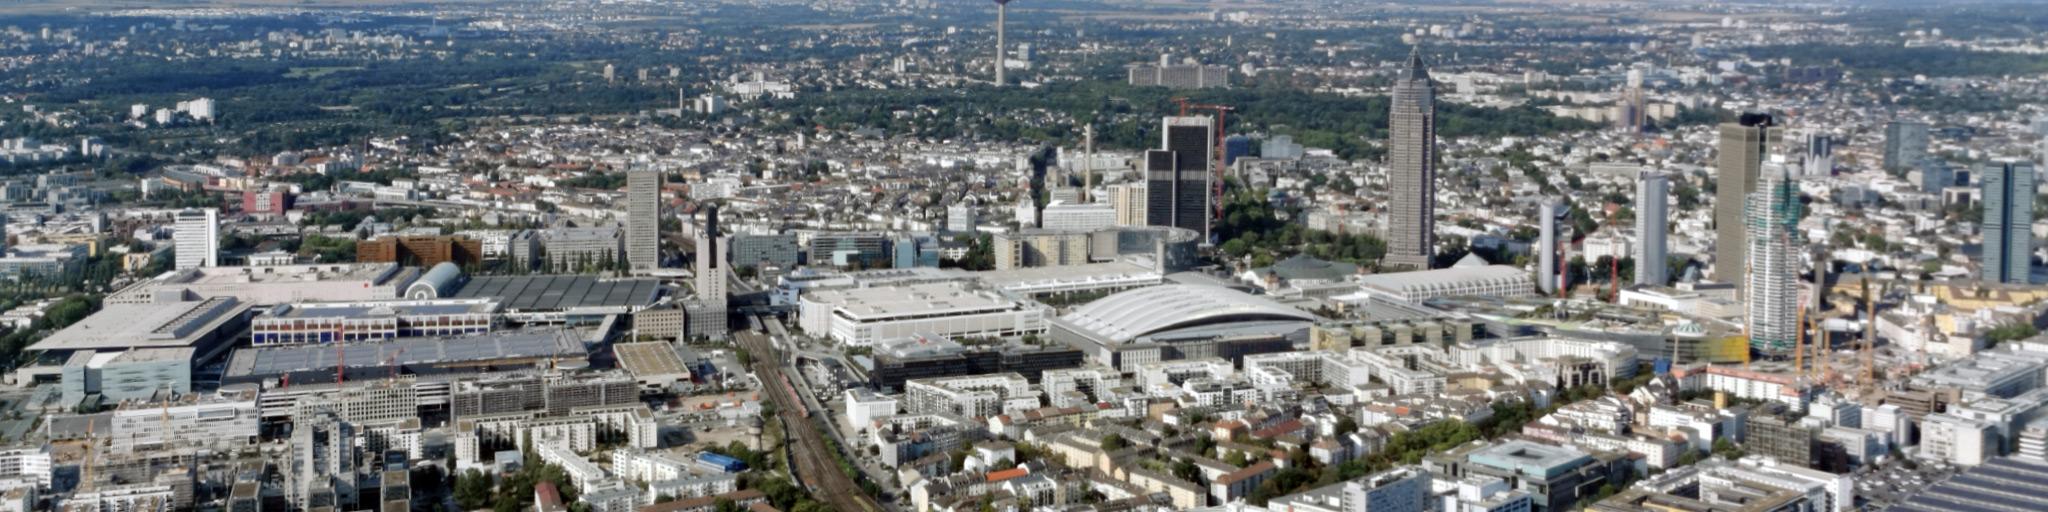 Europaviertel Frankfurt am Main - Panorama - Drohnenaufnahme - Luftaufnahme Frankfurt